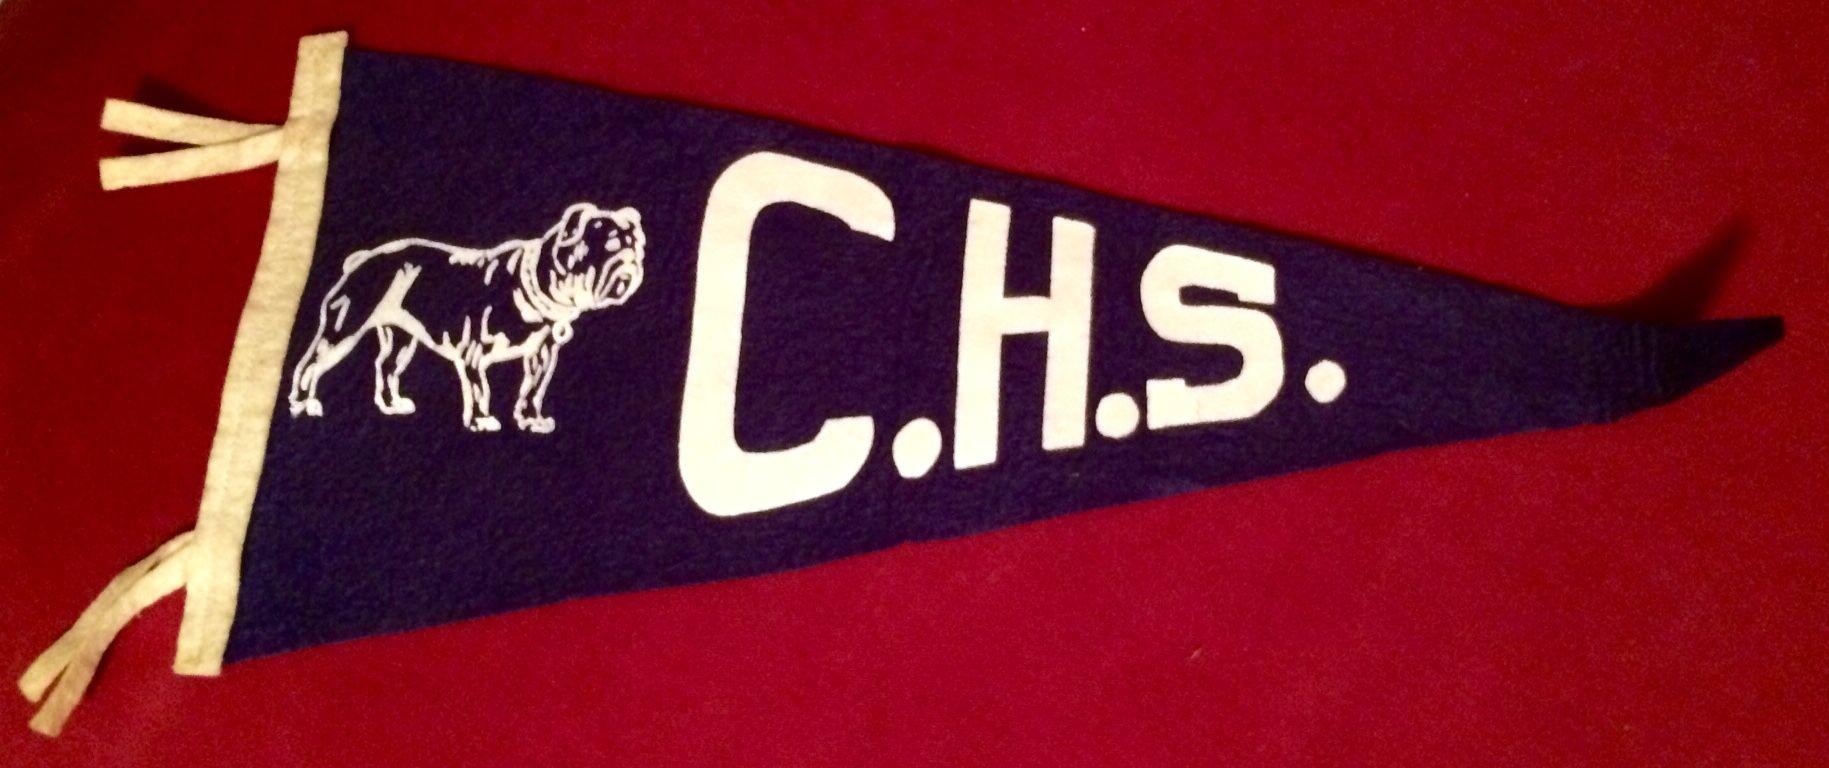 Pin by Michael Brown on Crockett Bulldogs Company logo